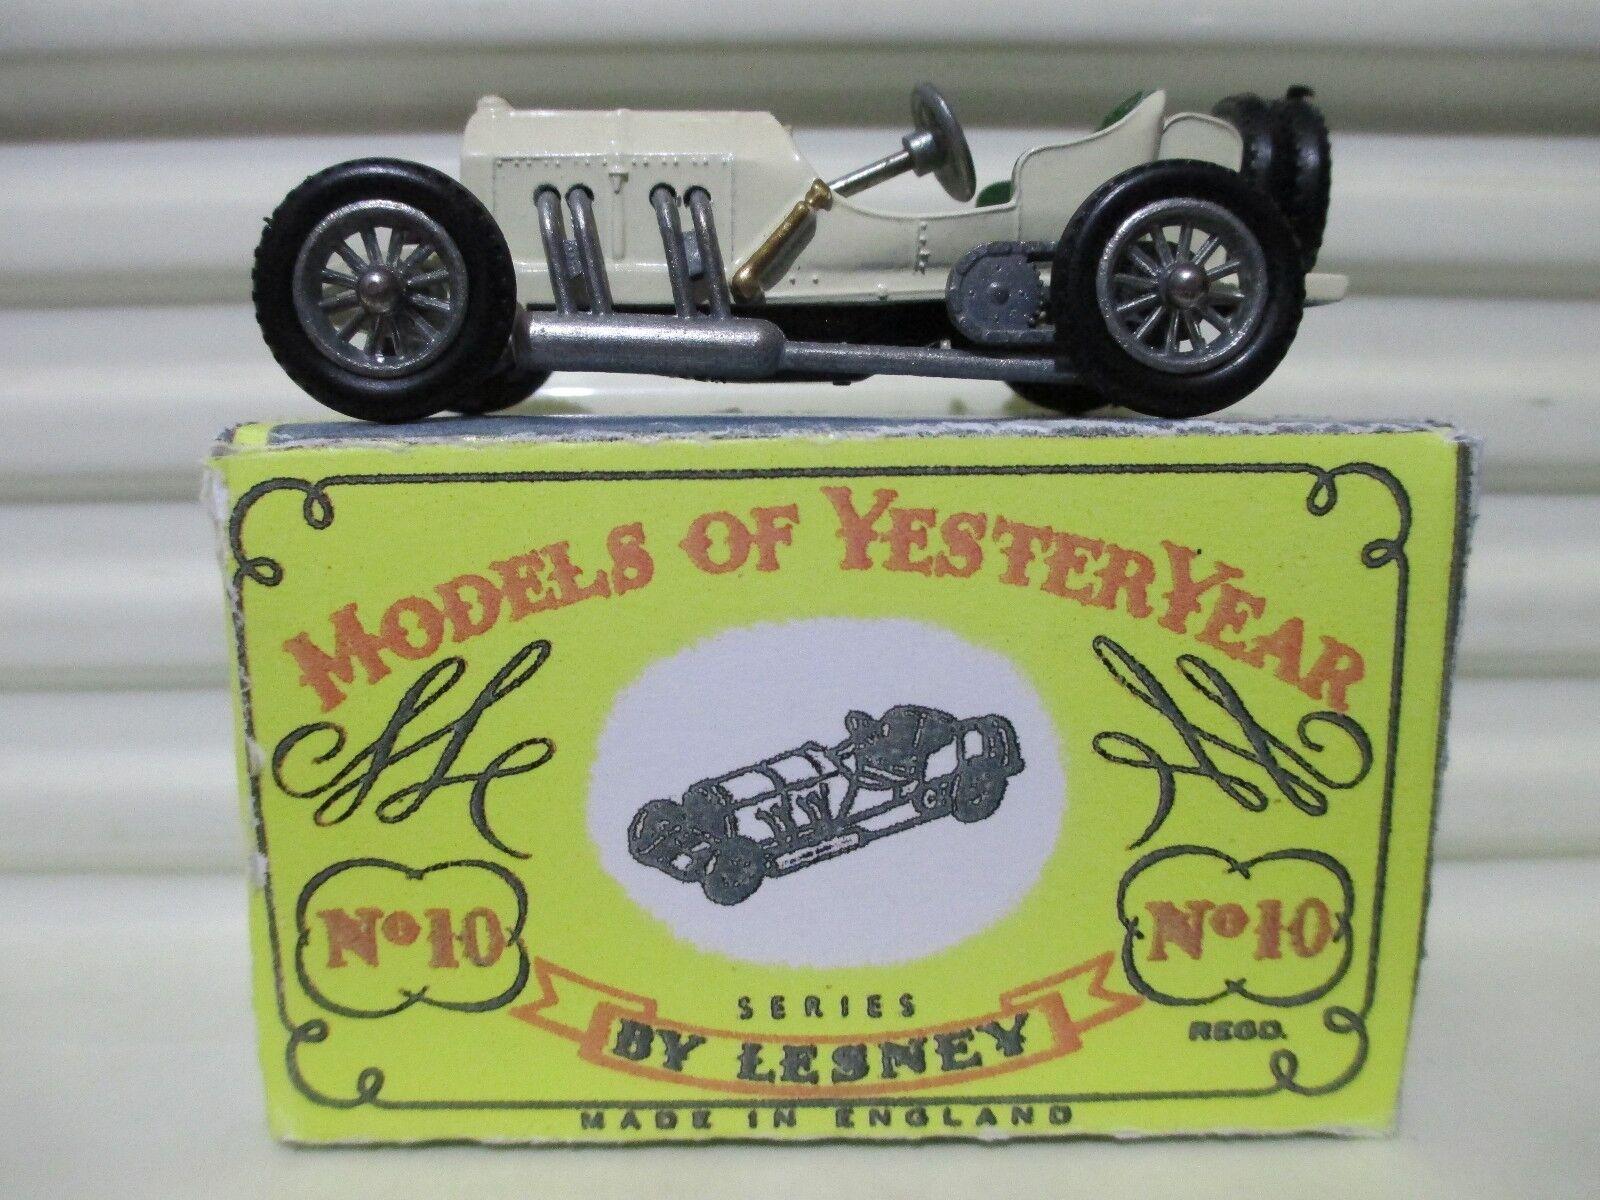 Matchbox 1958 YESTERYEAR Y10 1908 Cream +Dk Grn TYPE 2 Sts GP Mercedes Issue 10